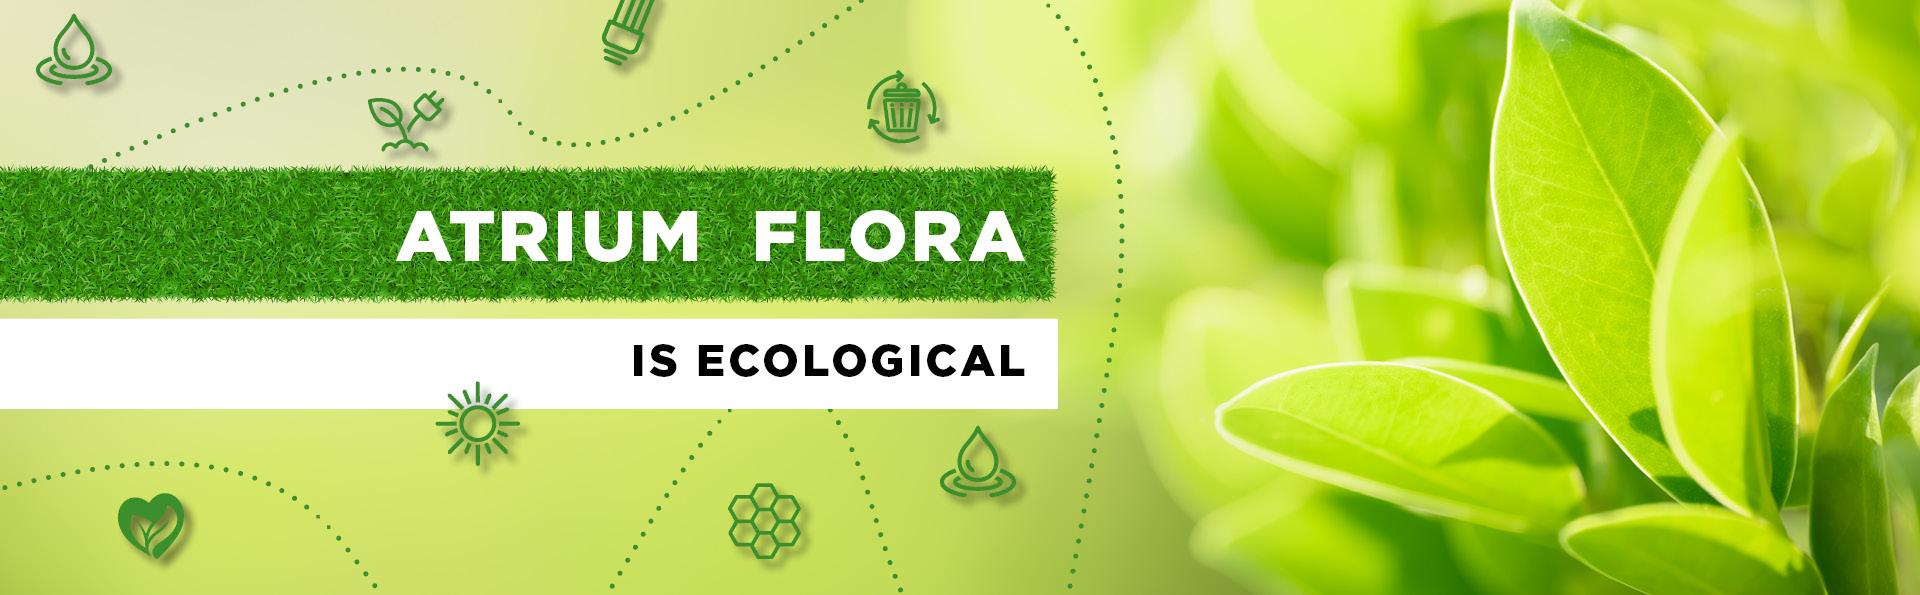 Atrium Flora is ecological